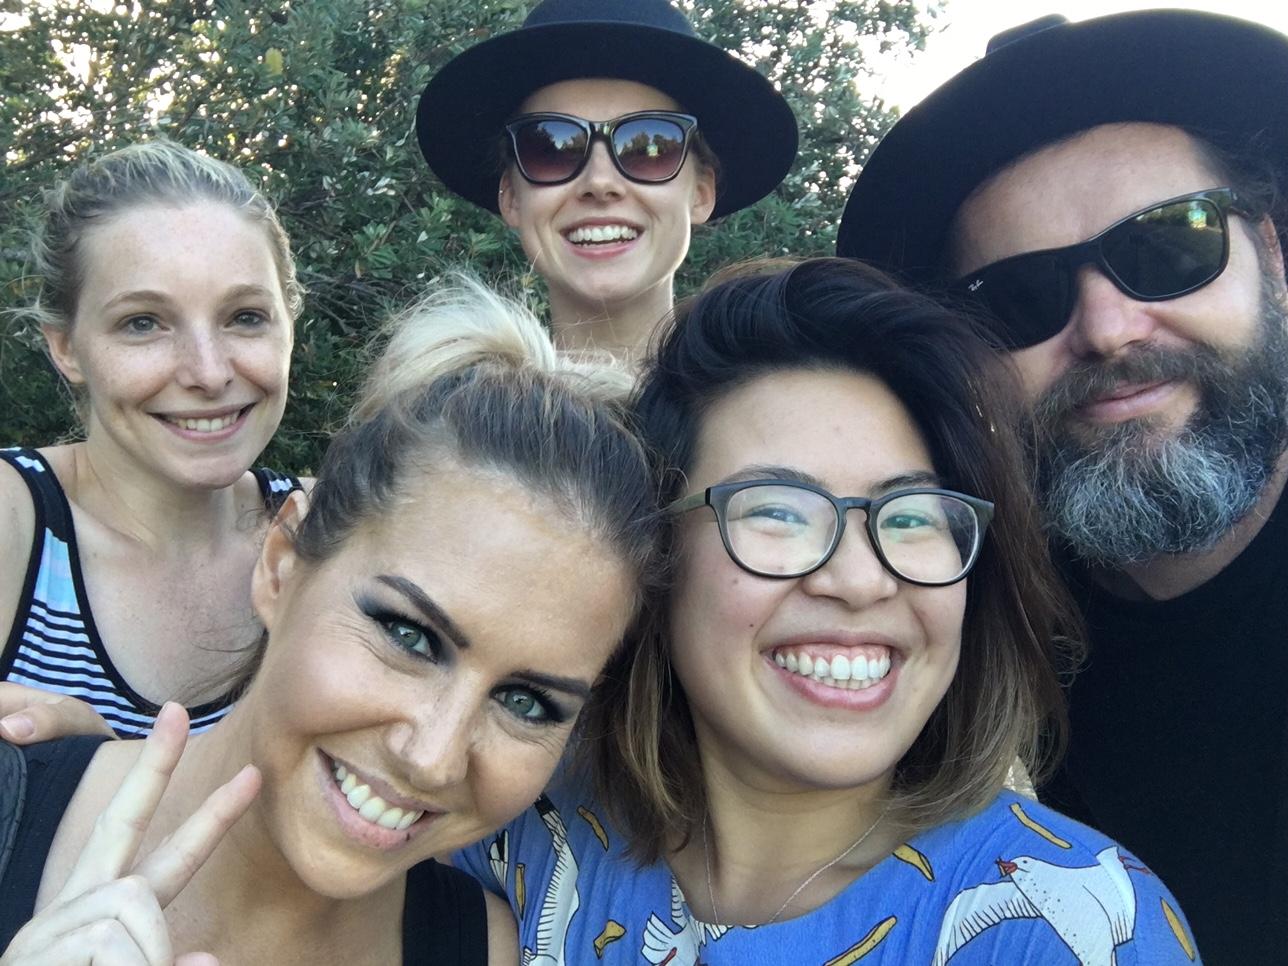 Kimberlee, Lyndel, Daniel, Rosemary & Janice - The team <3